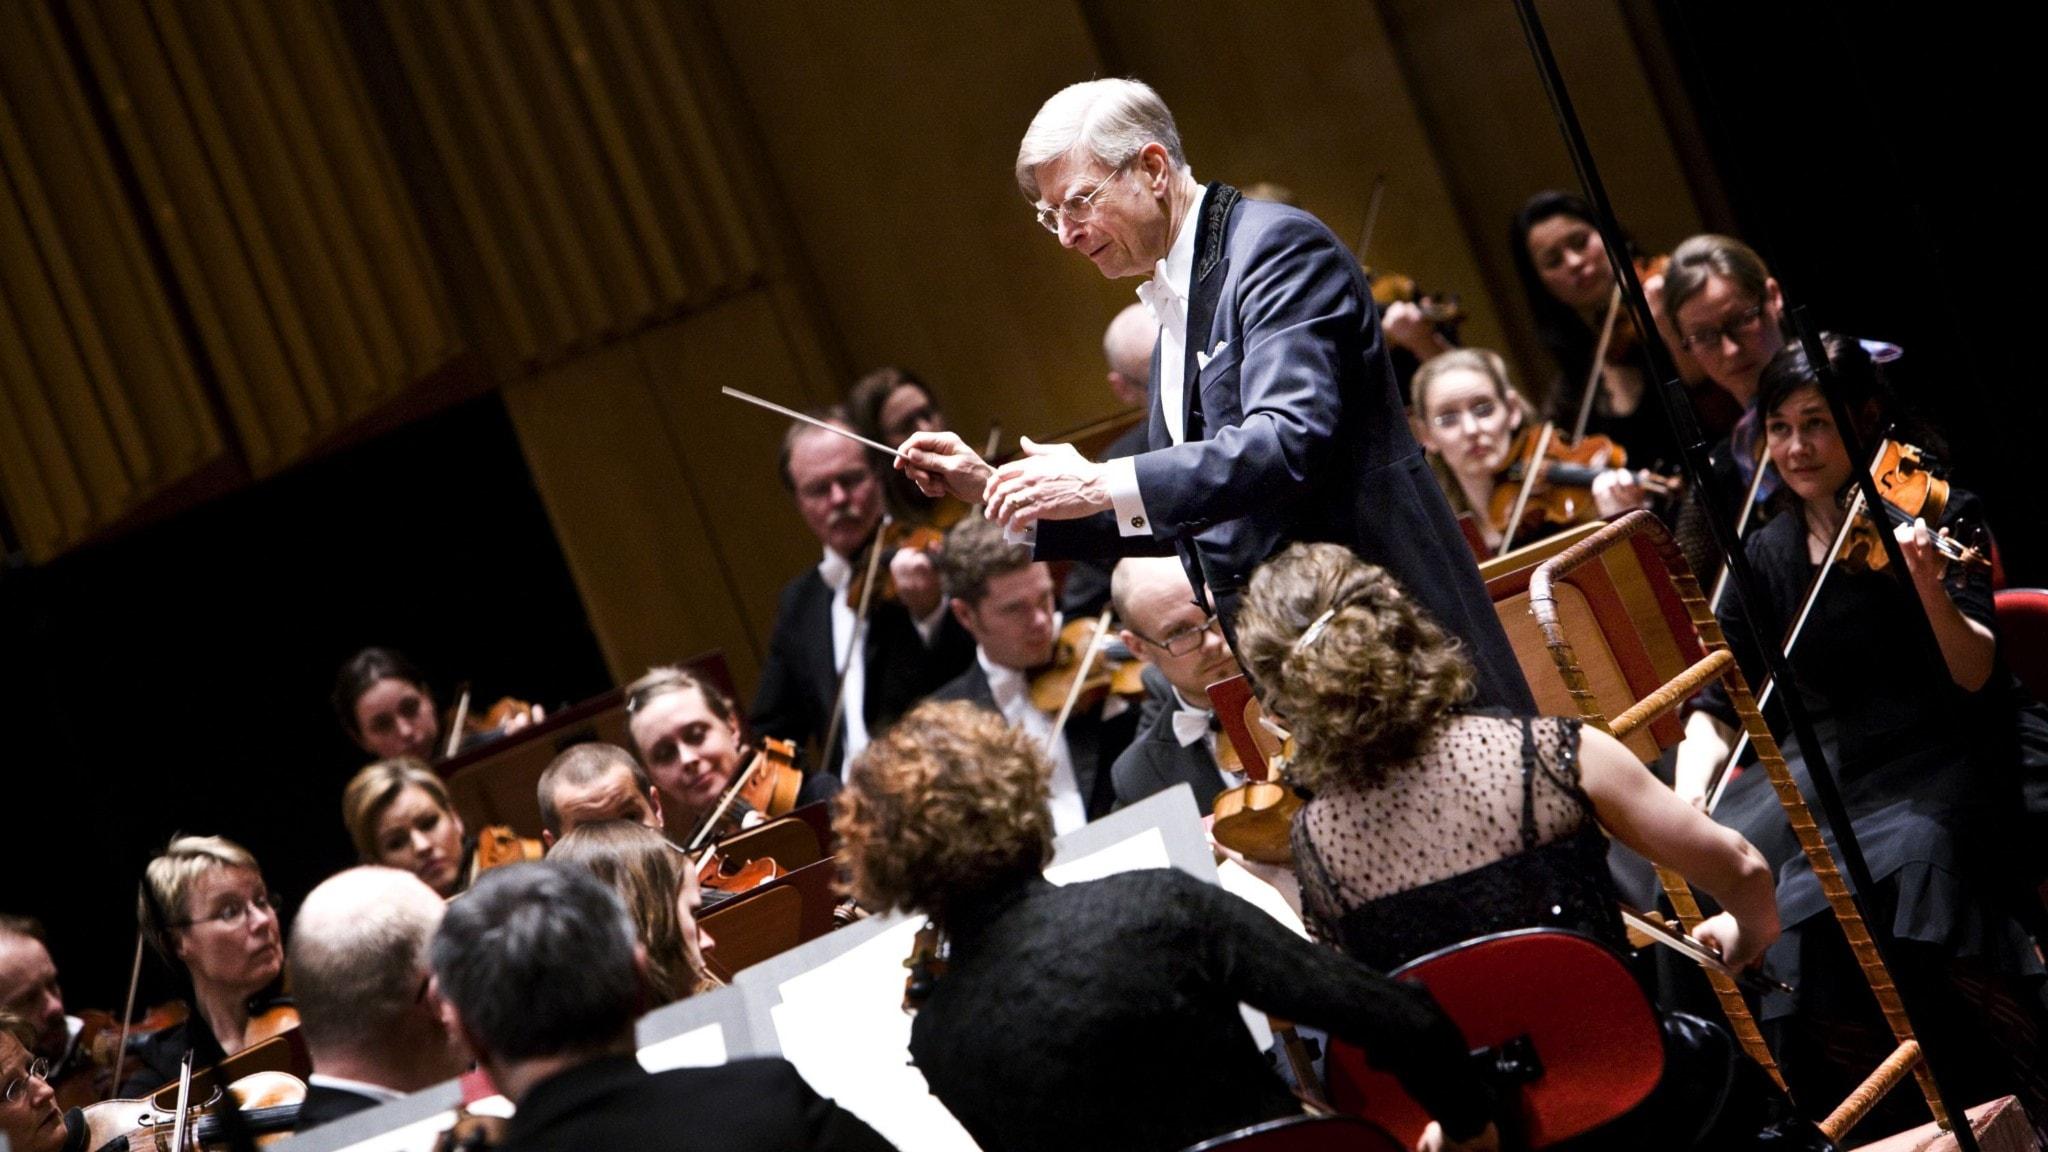 Bild: Herbert Blomstedt leder Radiosymfonikerna genom Beethovens Missa solemnis!